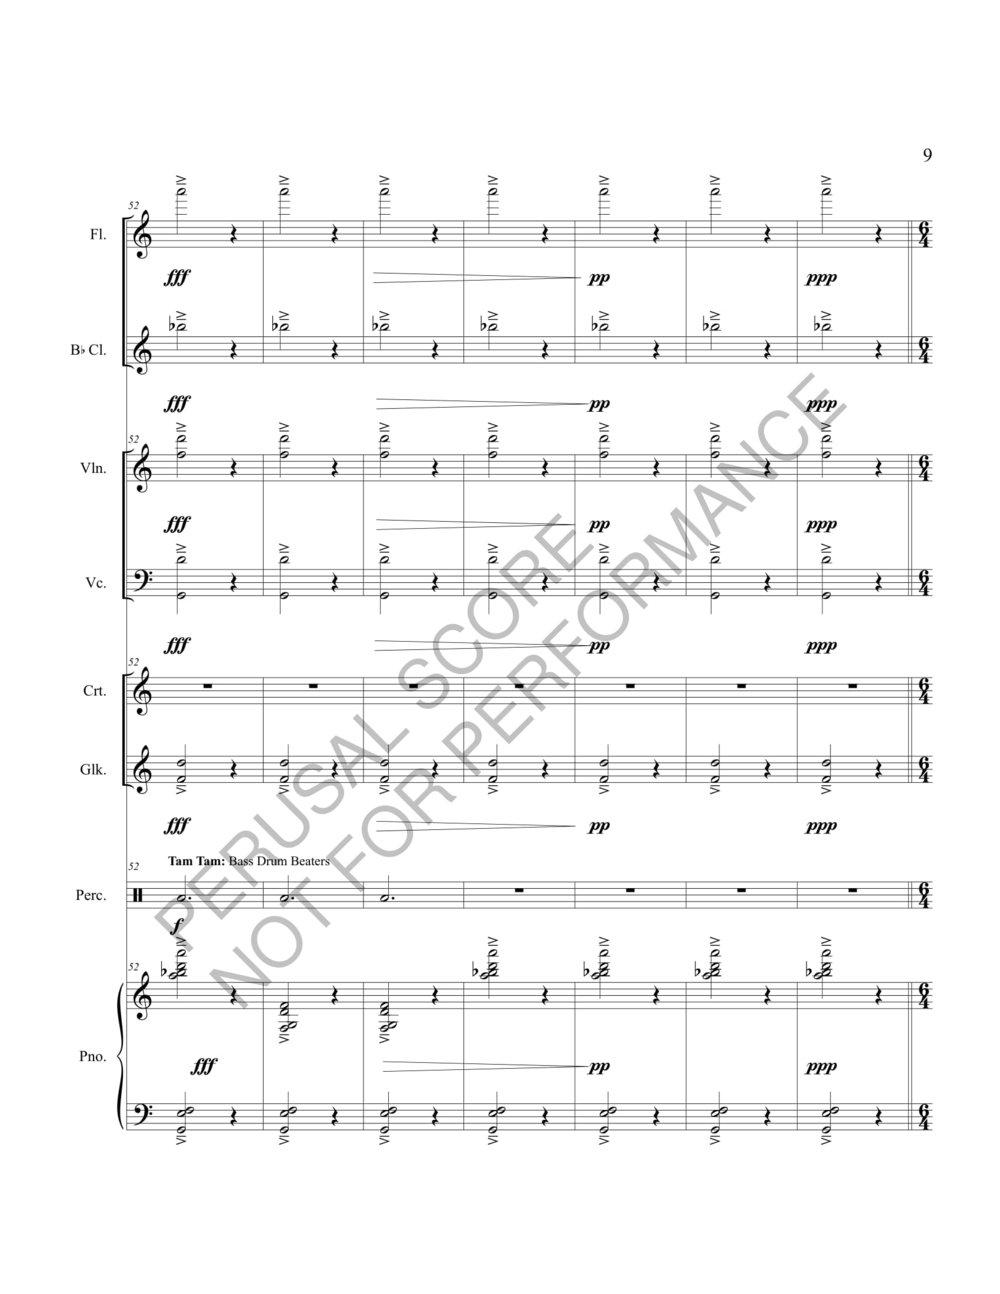 Boyd Terra Liberi Score-watermark-15.jpg